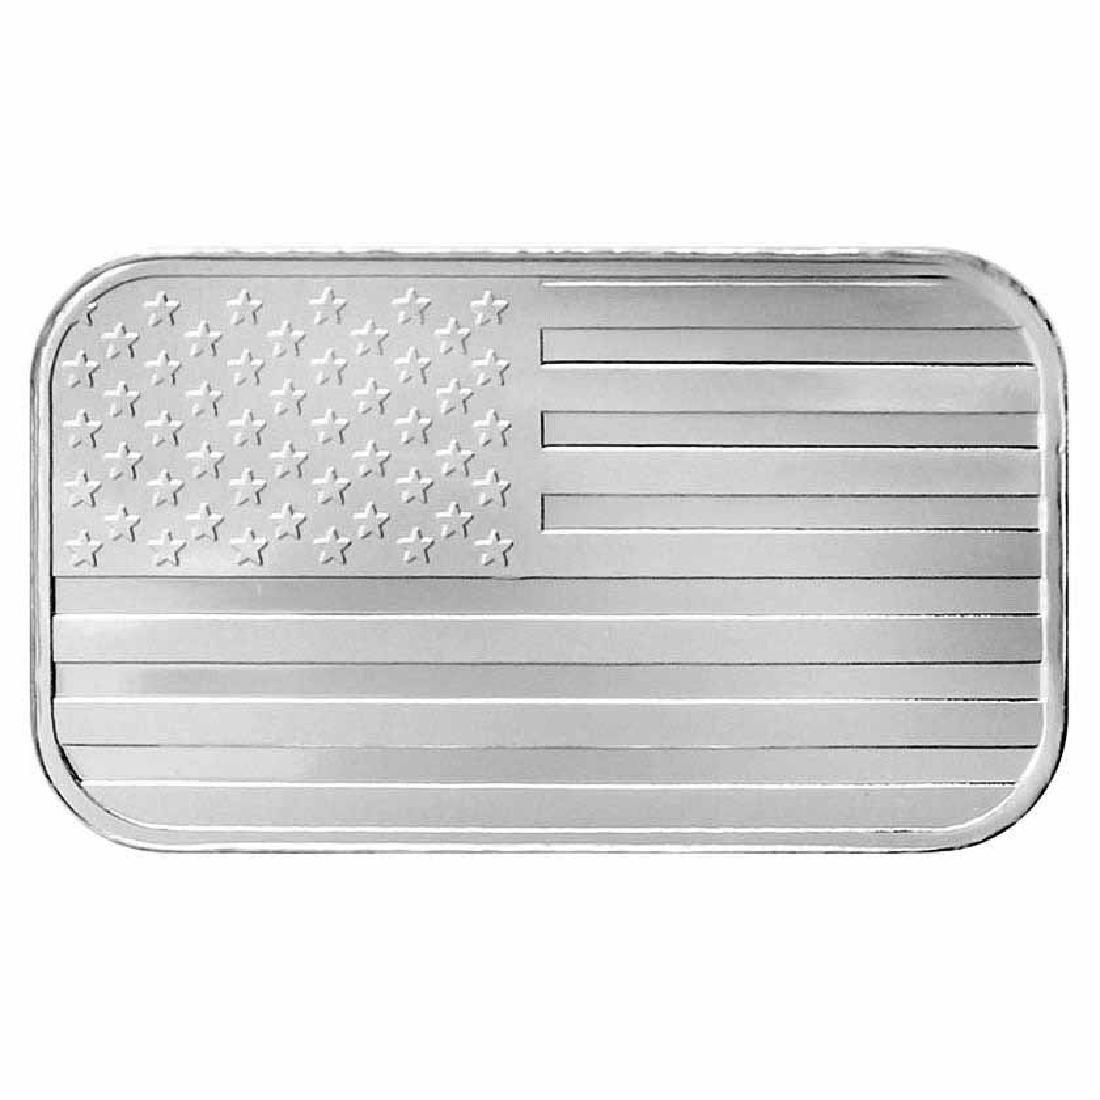 SilverTowne 1 oz Silver Bar - Flag Design